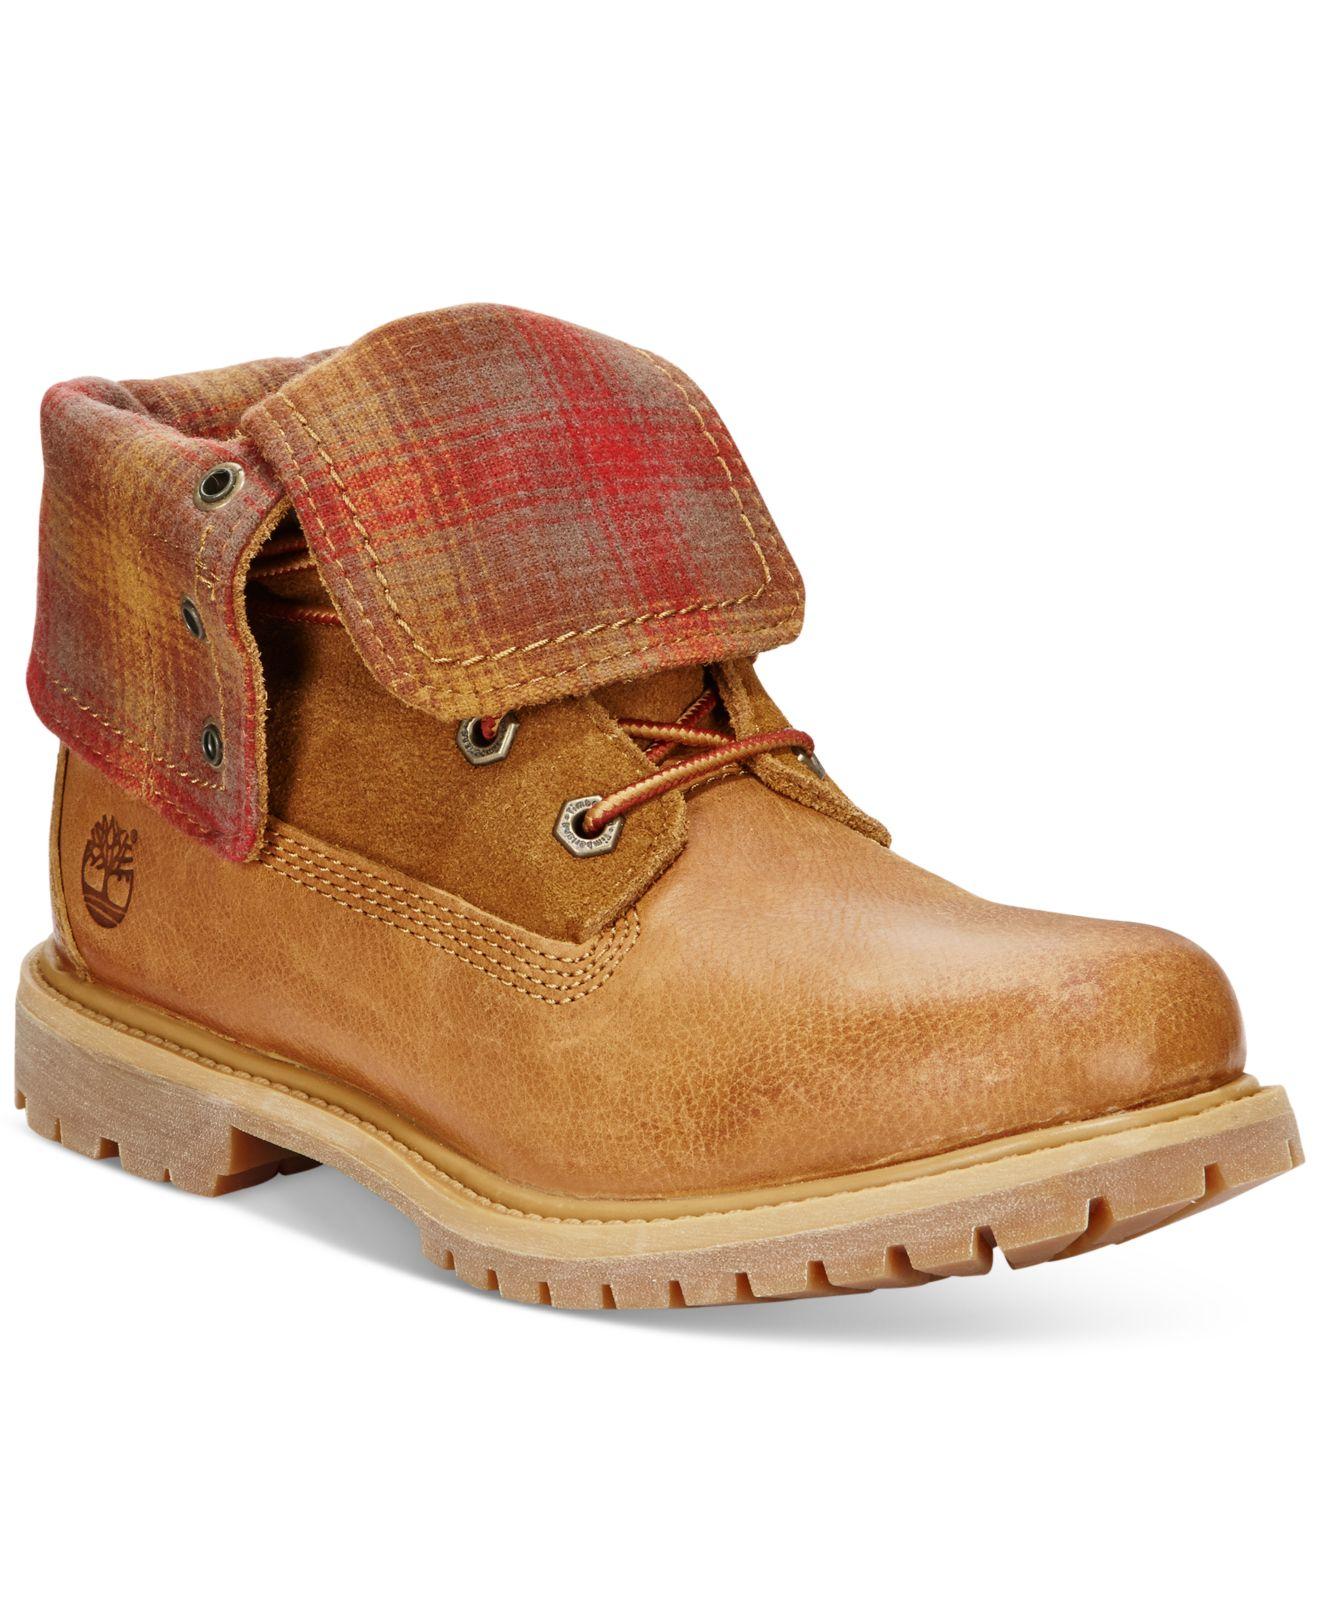 macys timberland boots